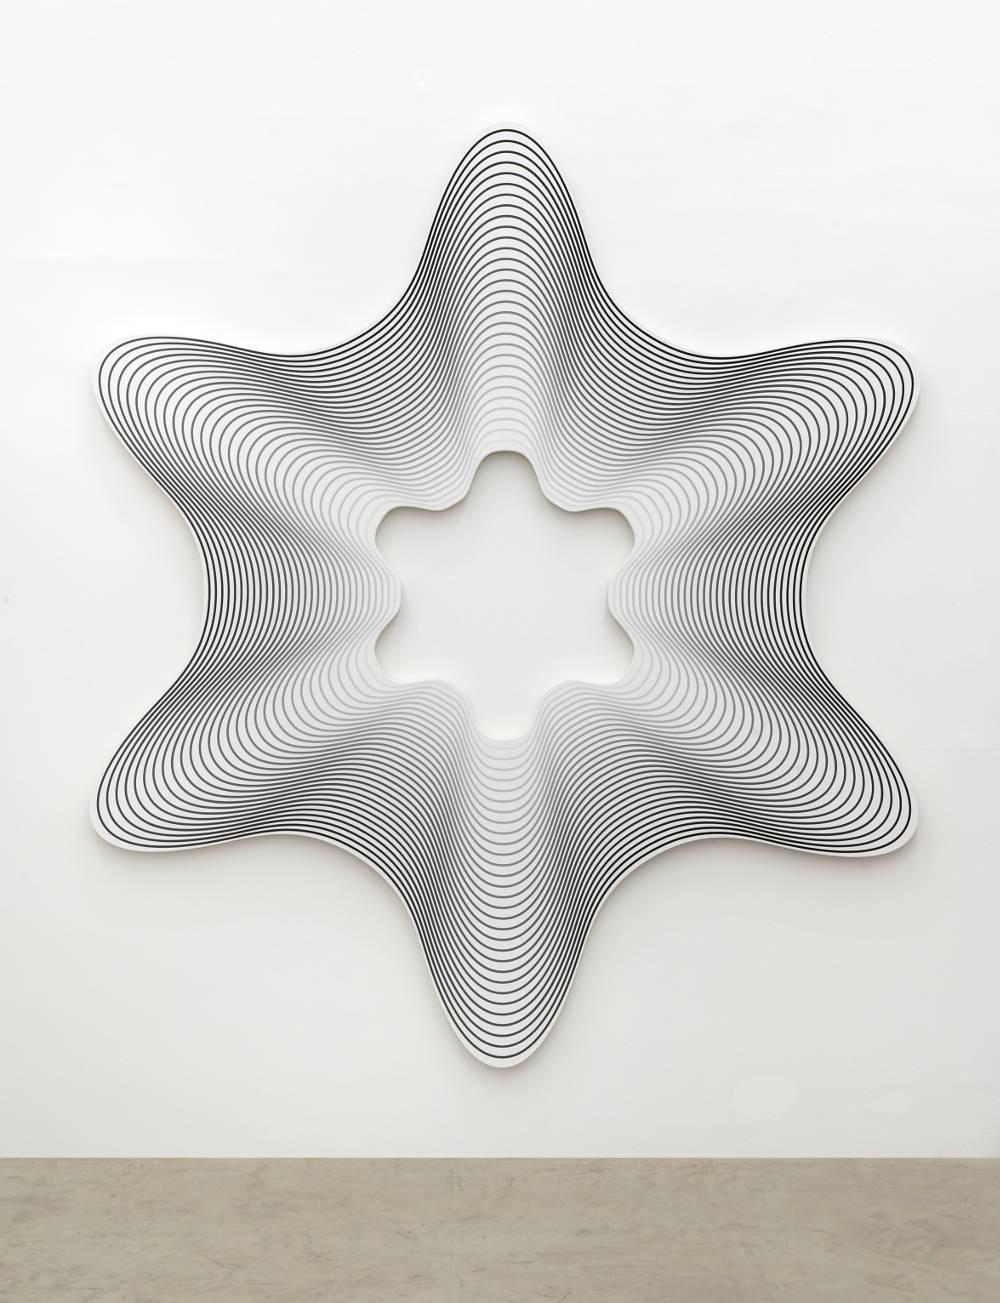 Philippe Decrauzat, Delay Exa # 3 (Black to White), 2019. Acrylic paint on canvas 235 x 206 x 3,5 cm/92.5 x 81.1 x 1.4 in. Photo © Nei Toledo. Courtesy of the artist and Galeria Nara Roesler